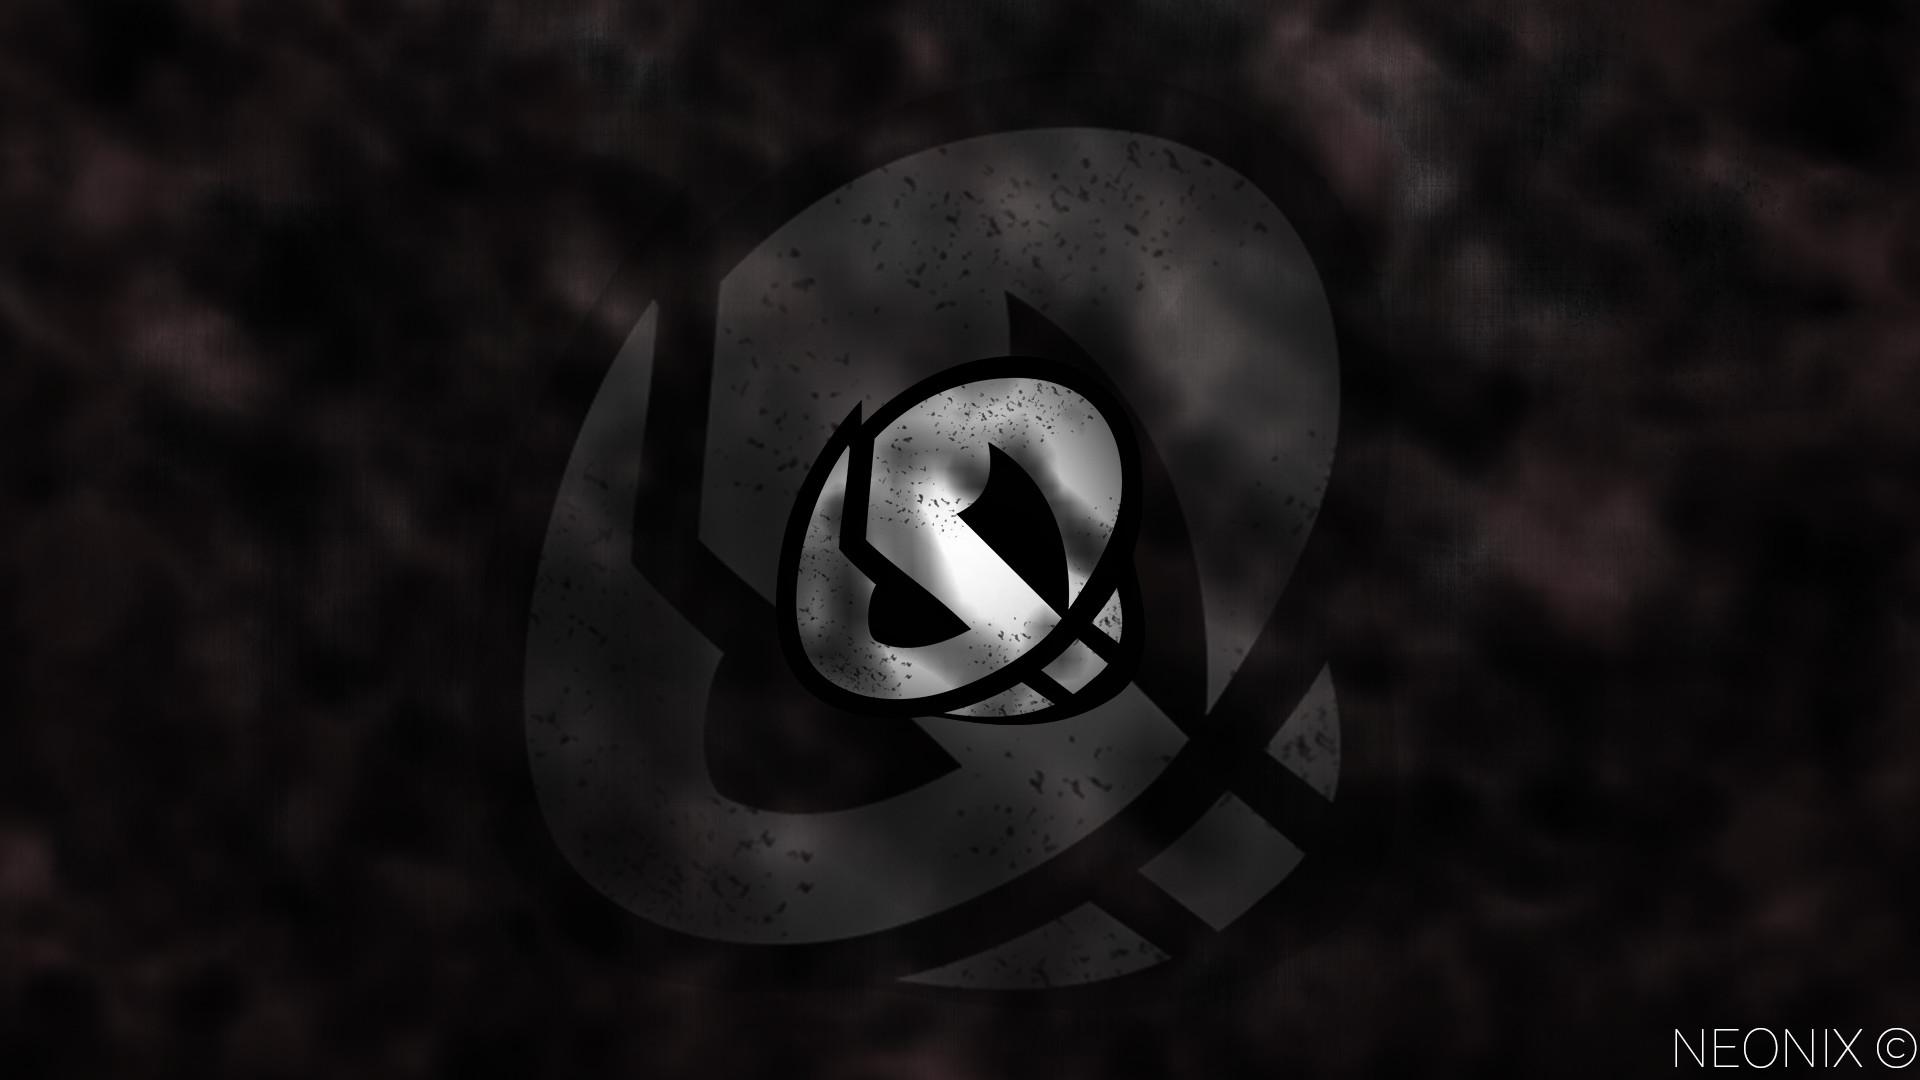 … Team Skull Wallpaper (Pokemon Sun And Moon) by NeoniXArt